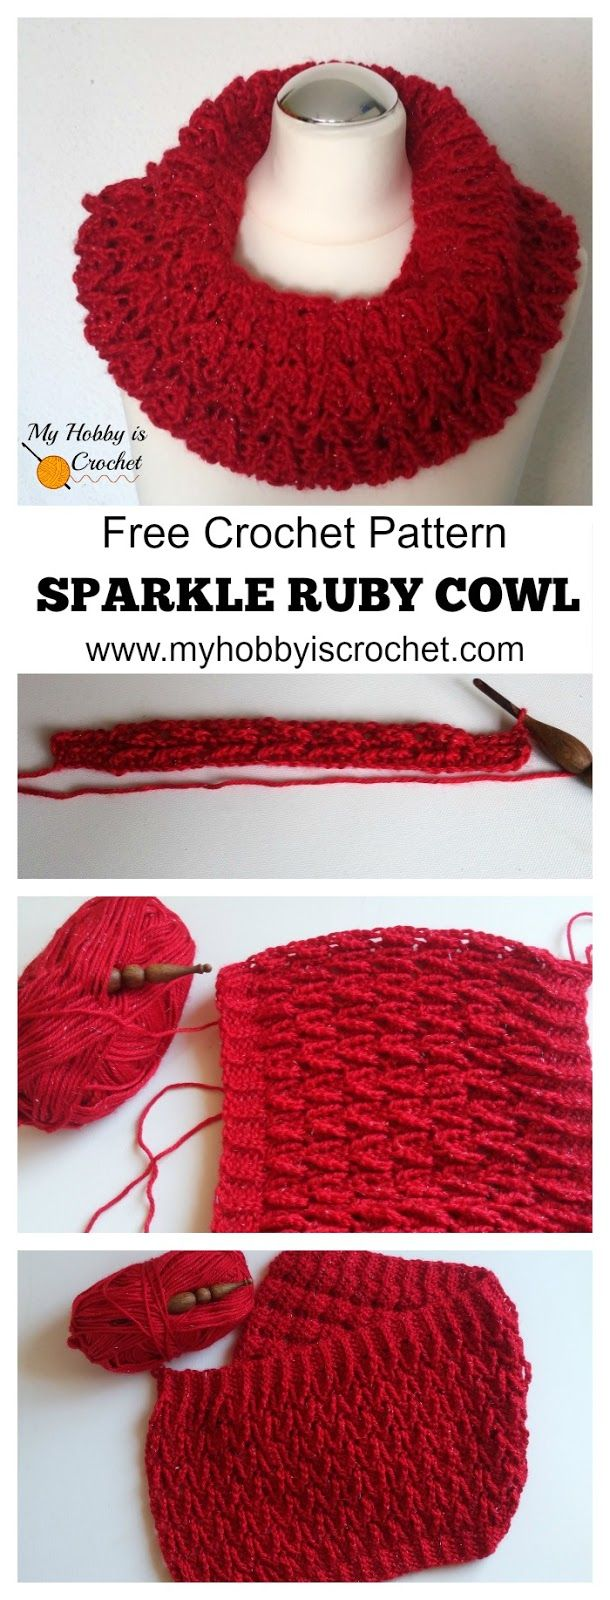 Sparkle Ruby Cowl - #freecrochetpattern with #tutorial on myhobbyiscrochet.com